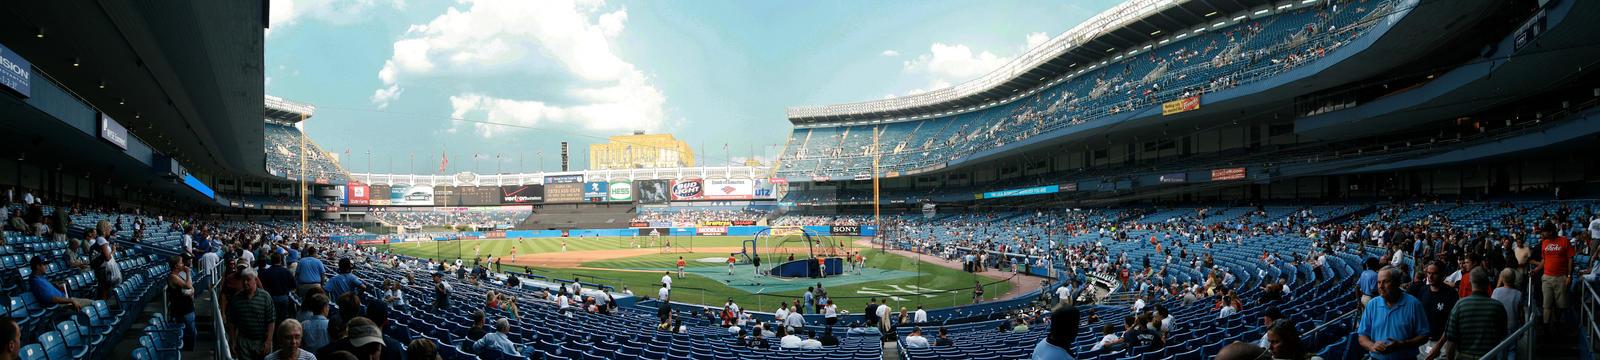 Ye Olde Yankee Stadium by Diamonddaveny